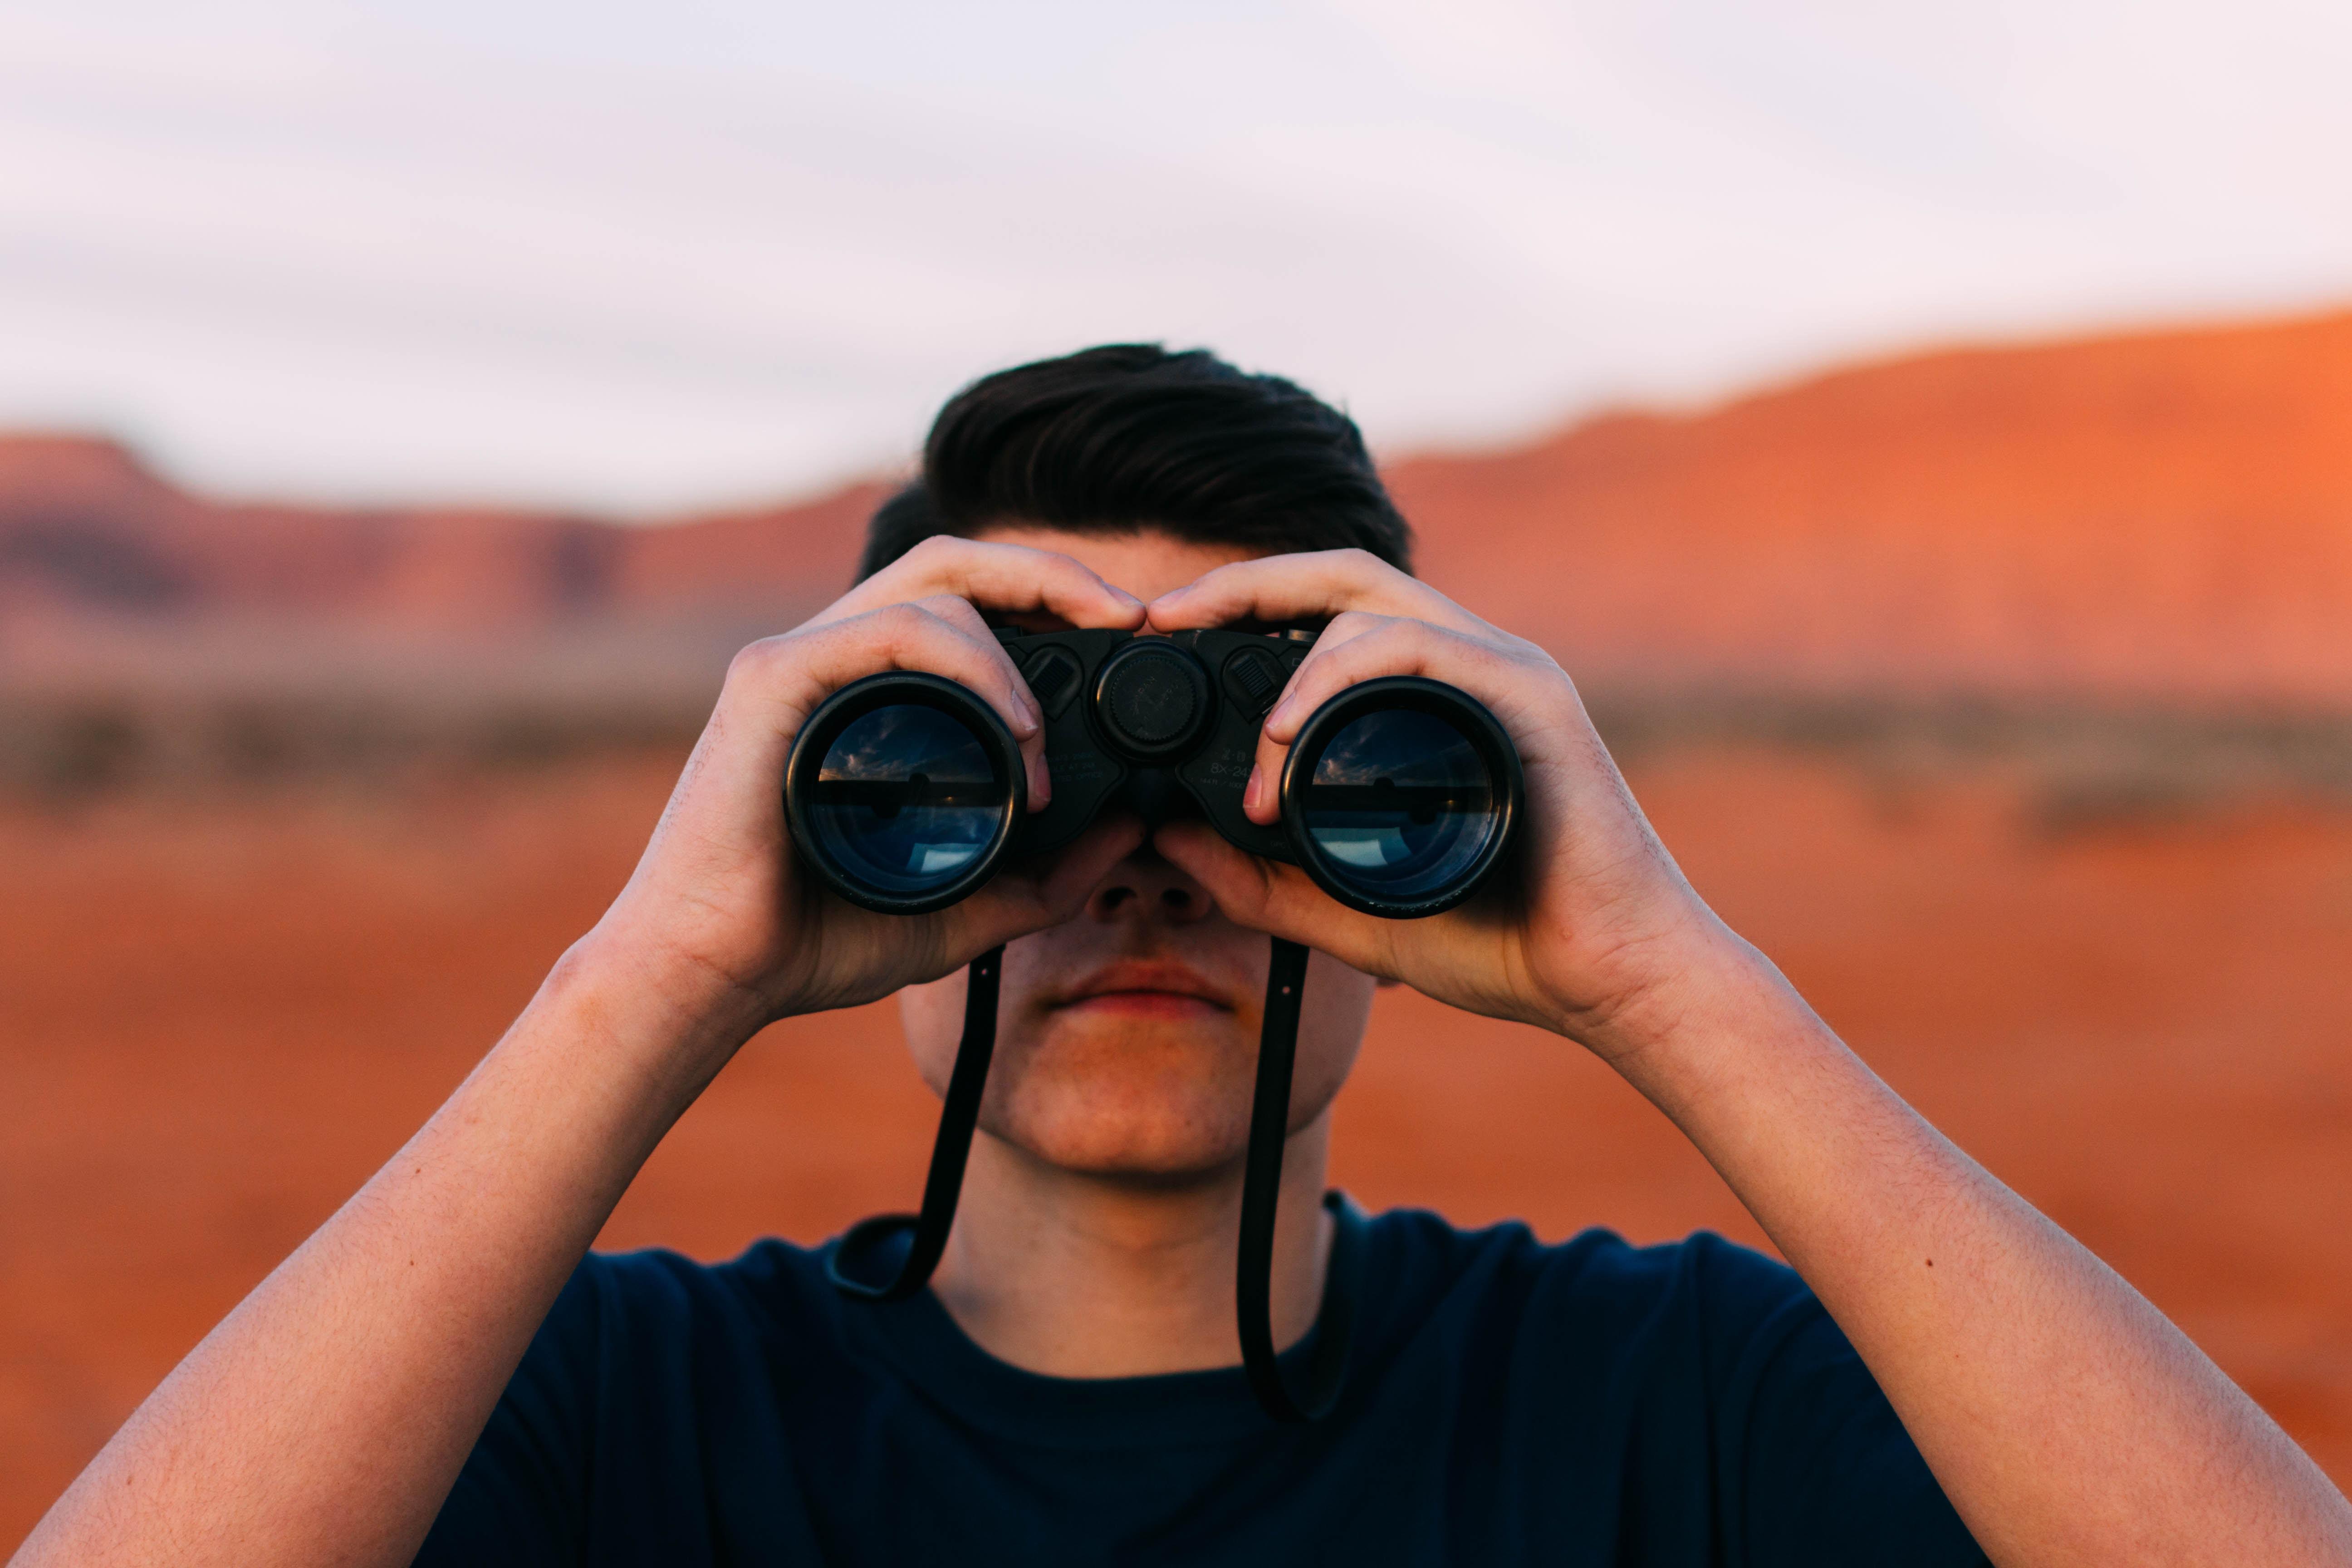 man facing the camera looking through binoculars